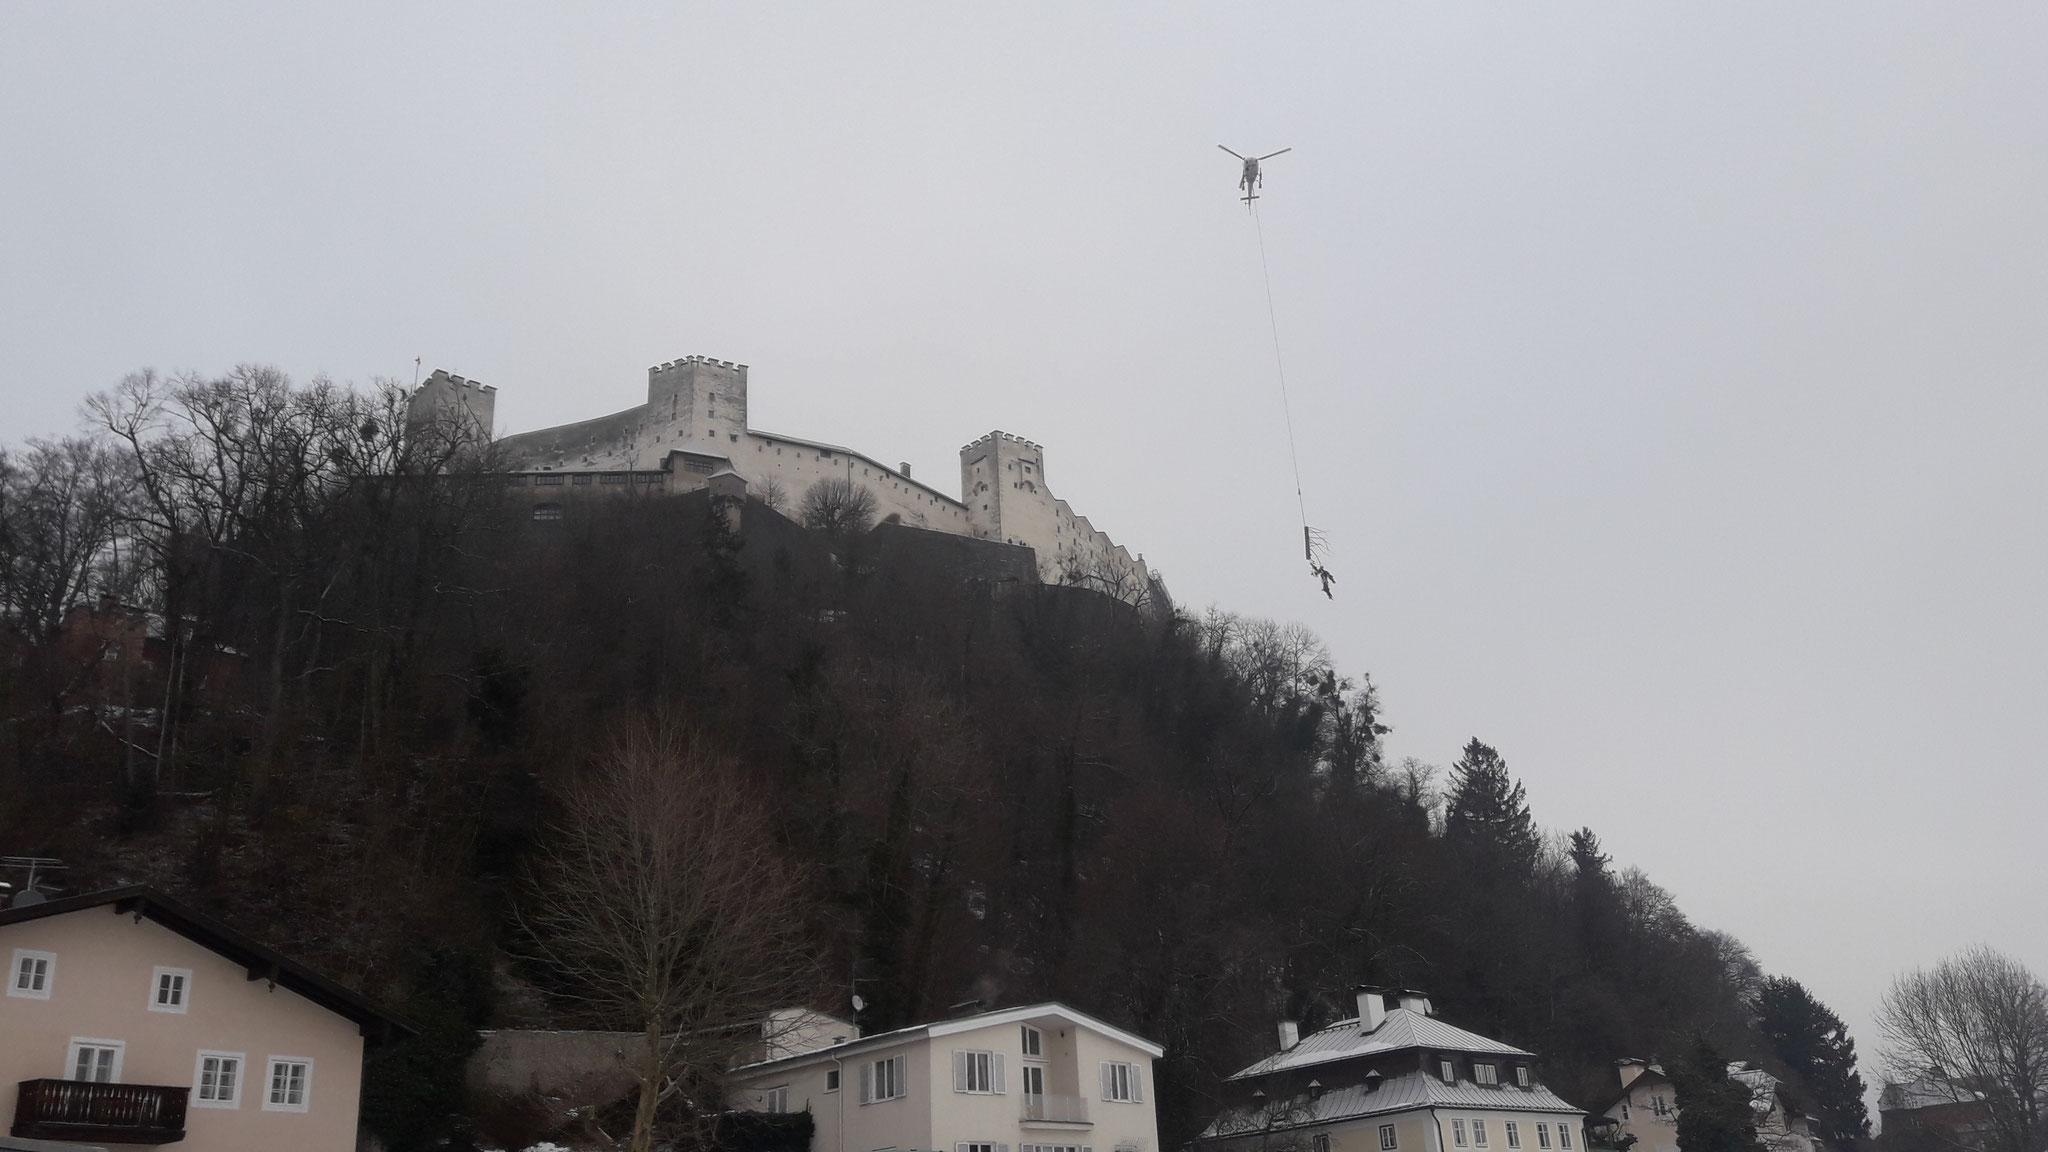 Helikopterfällung Salzburg